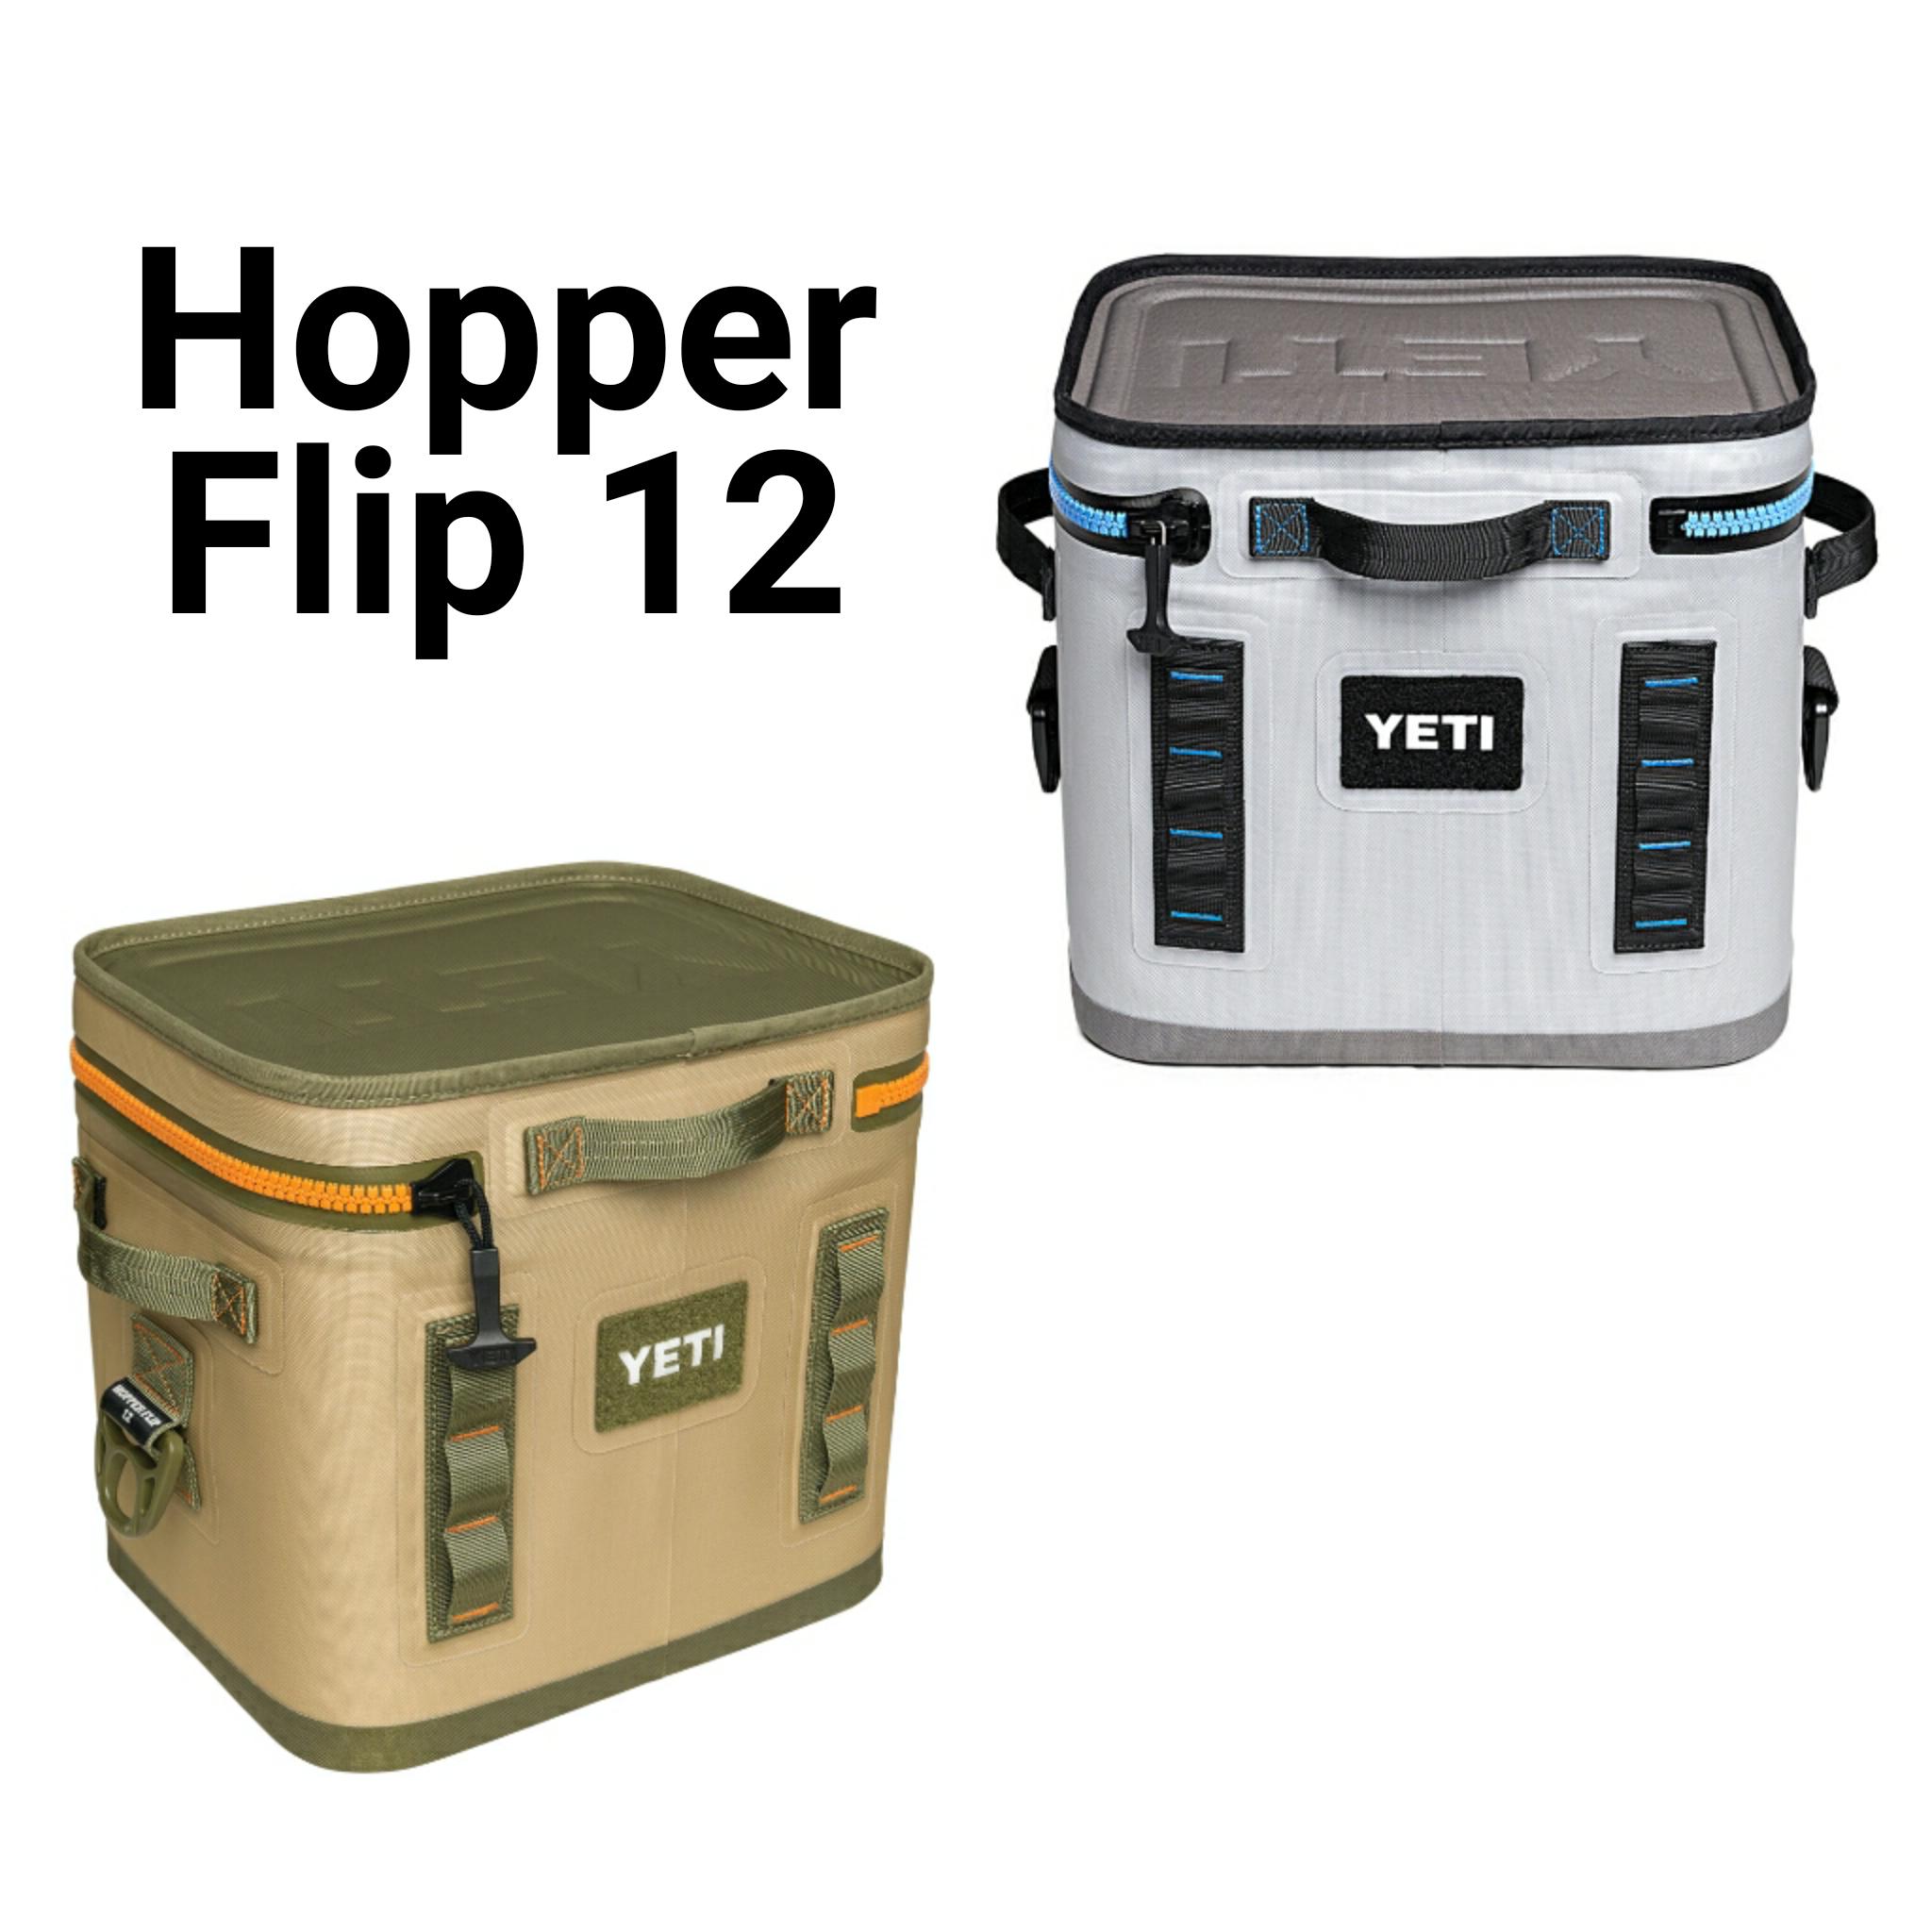 16ef3ce4cbb651 YETI Hopper Flip 12 - Woodard Mercantile